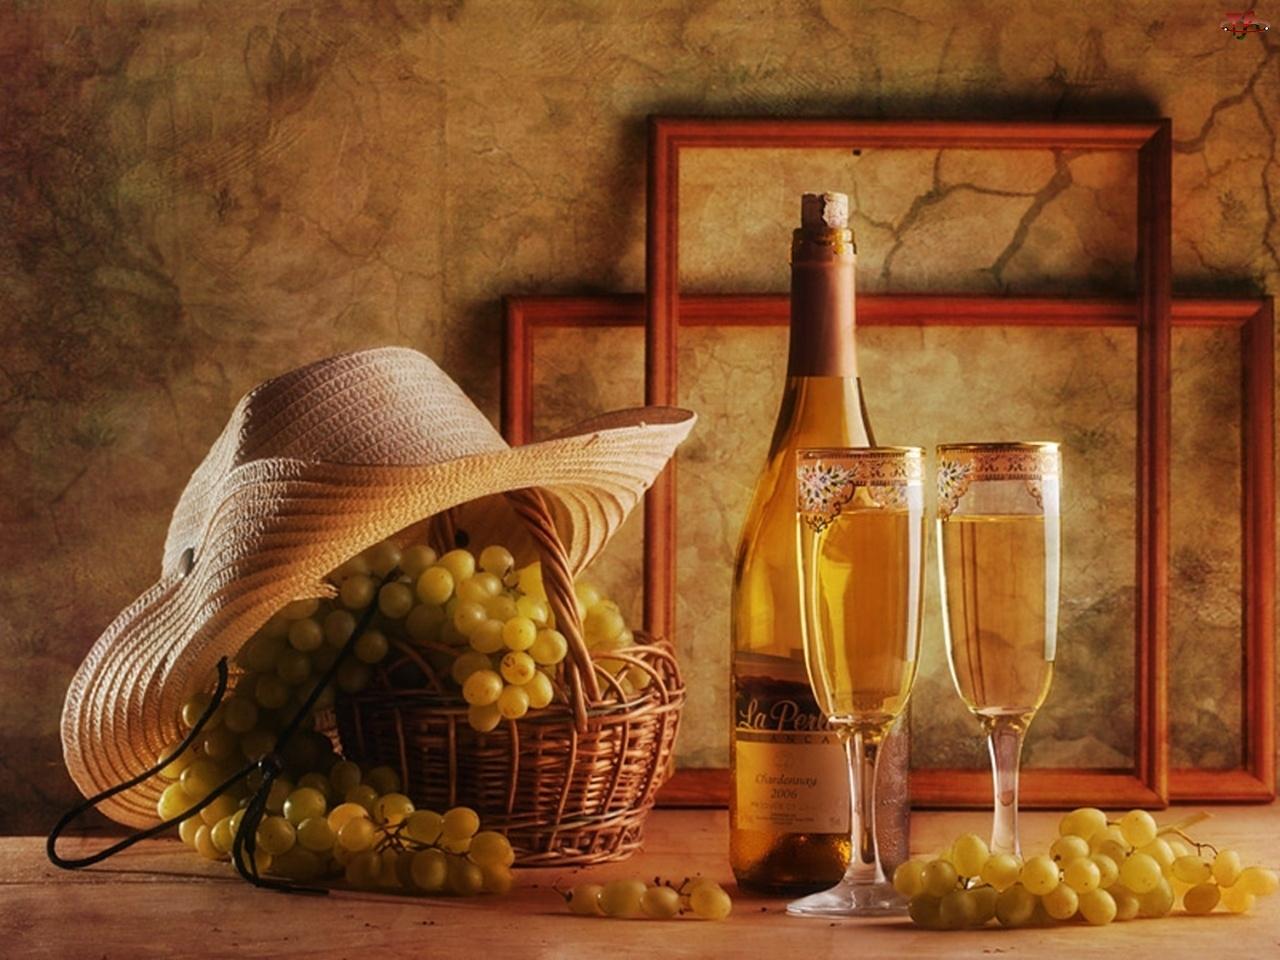 Winogrona, Kieliszki, Wino